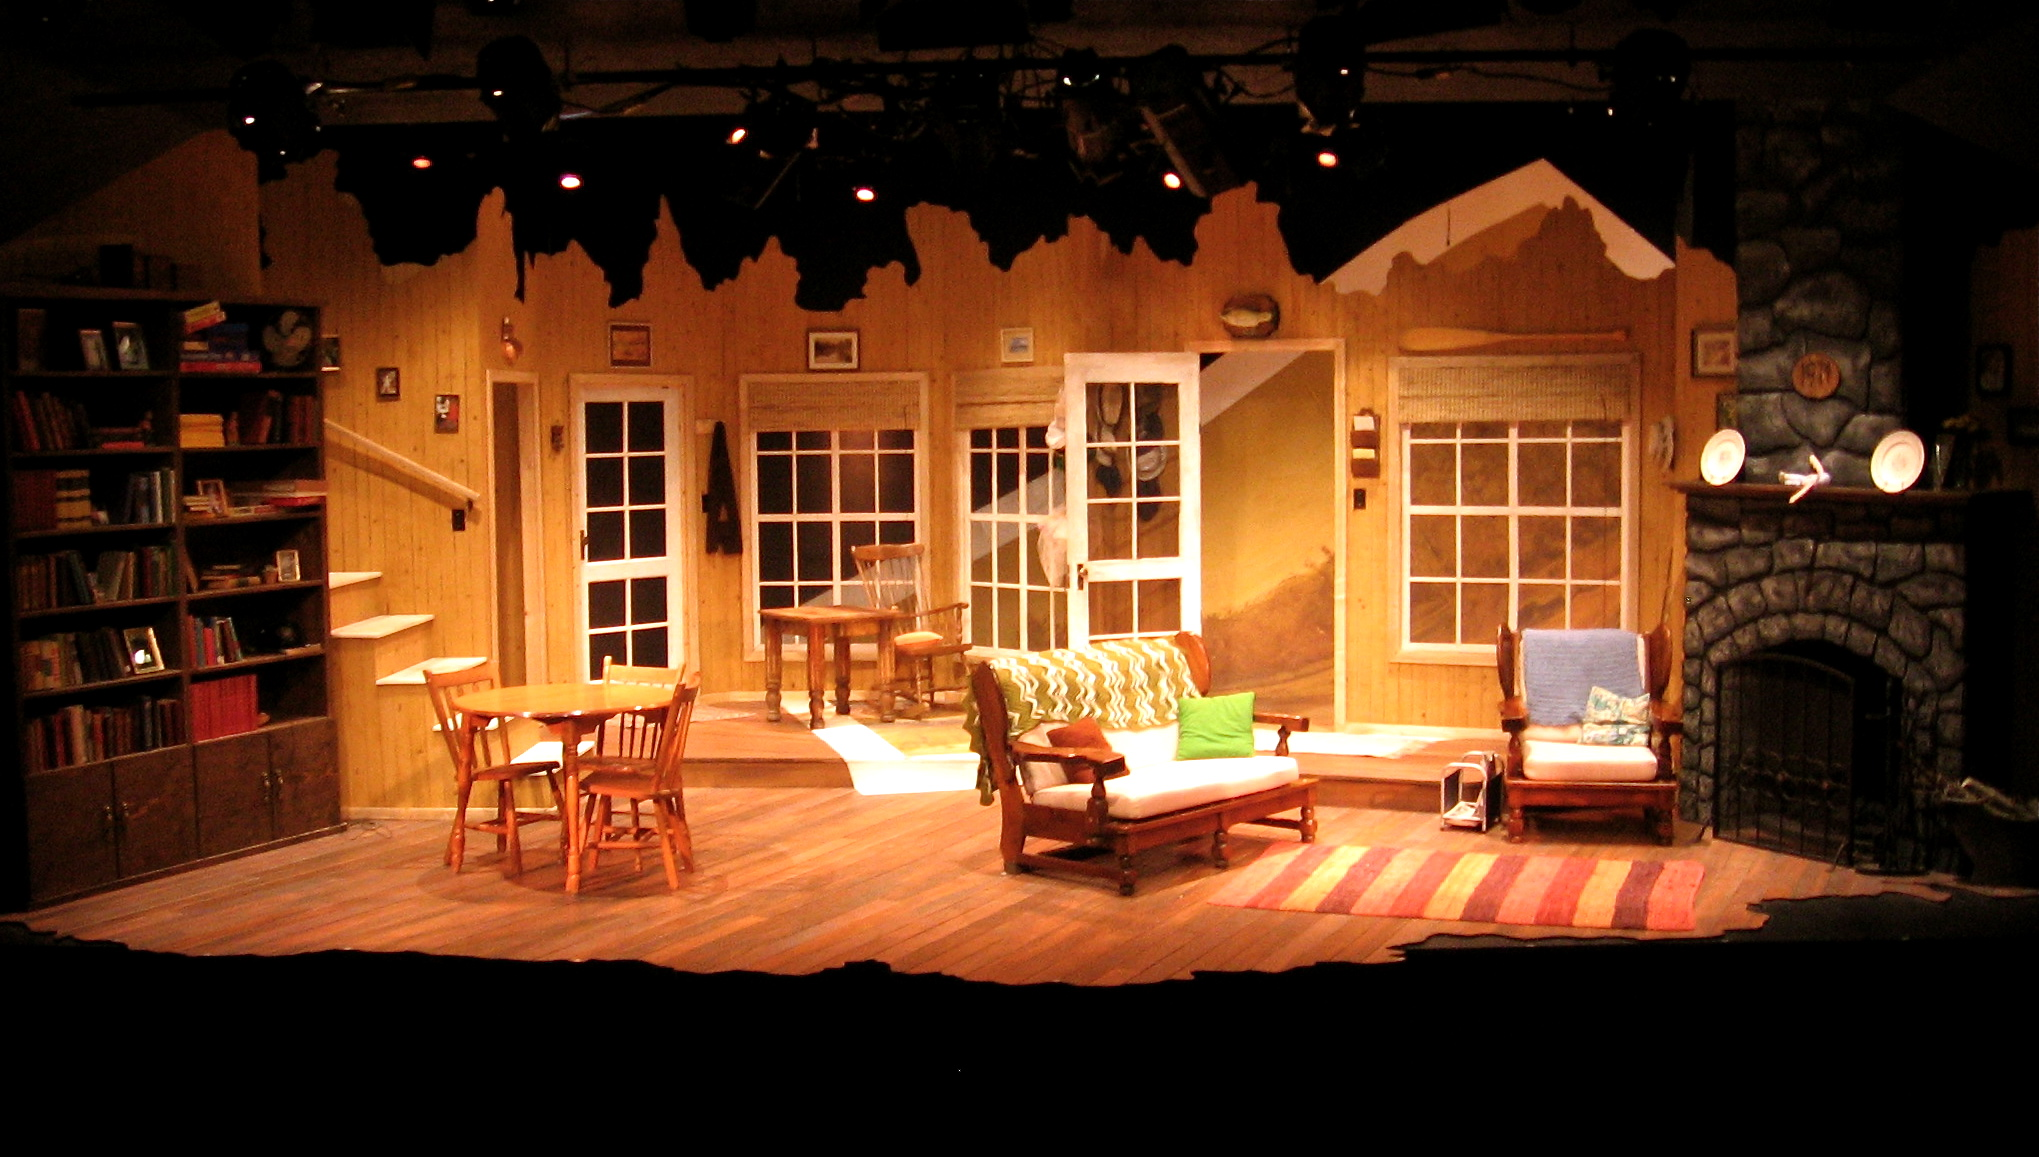 On Golden Pond - Rosebud Theatre